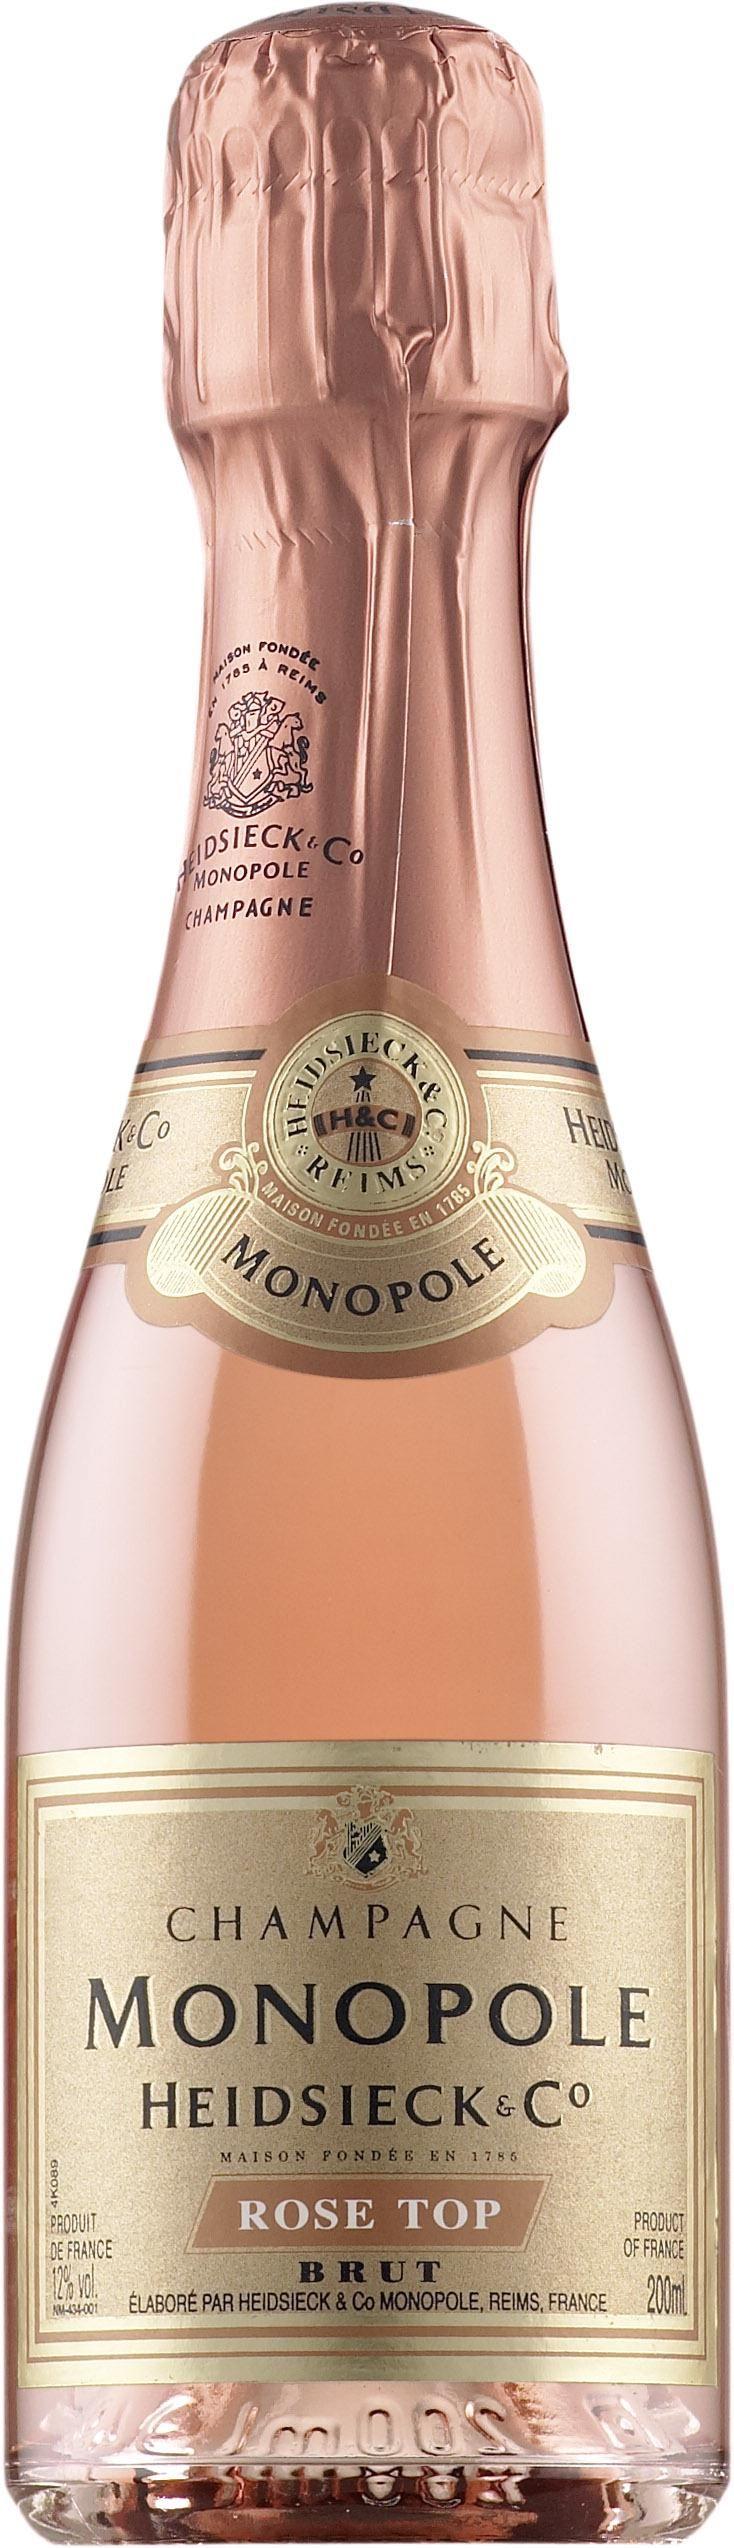 Heidsieck Monopole Rosé Top Brut